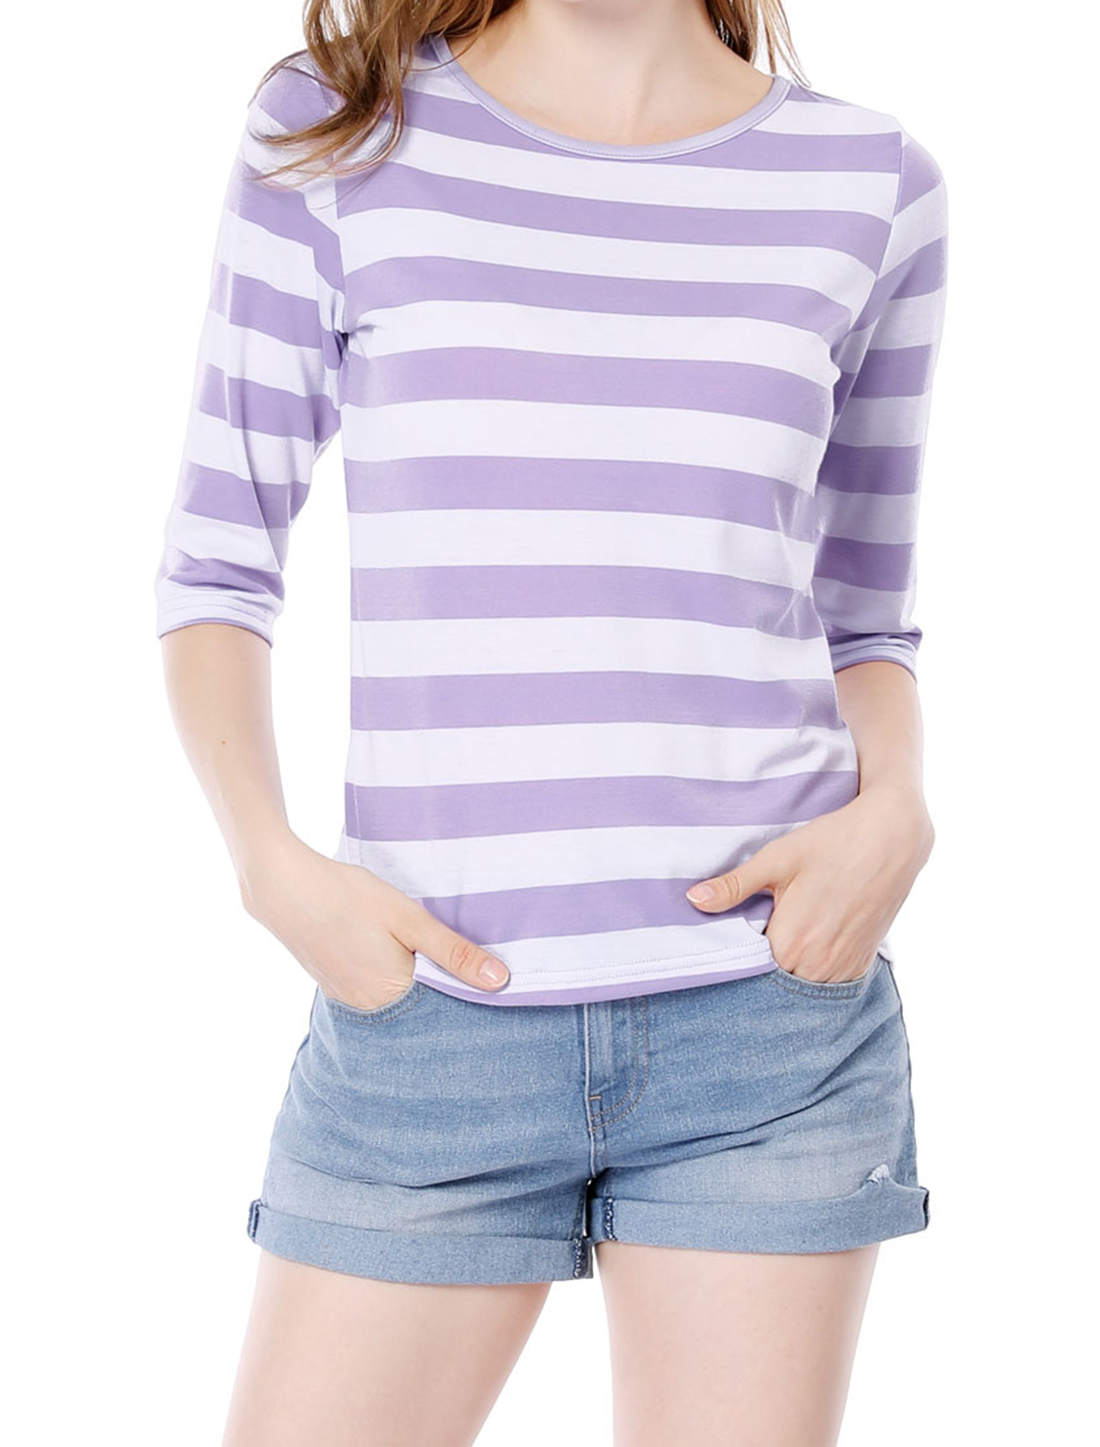 Women 1/2 Sleeves Contrast Color Stripes T-shirt Light Purple White XL